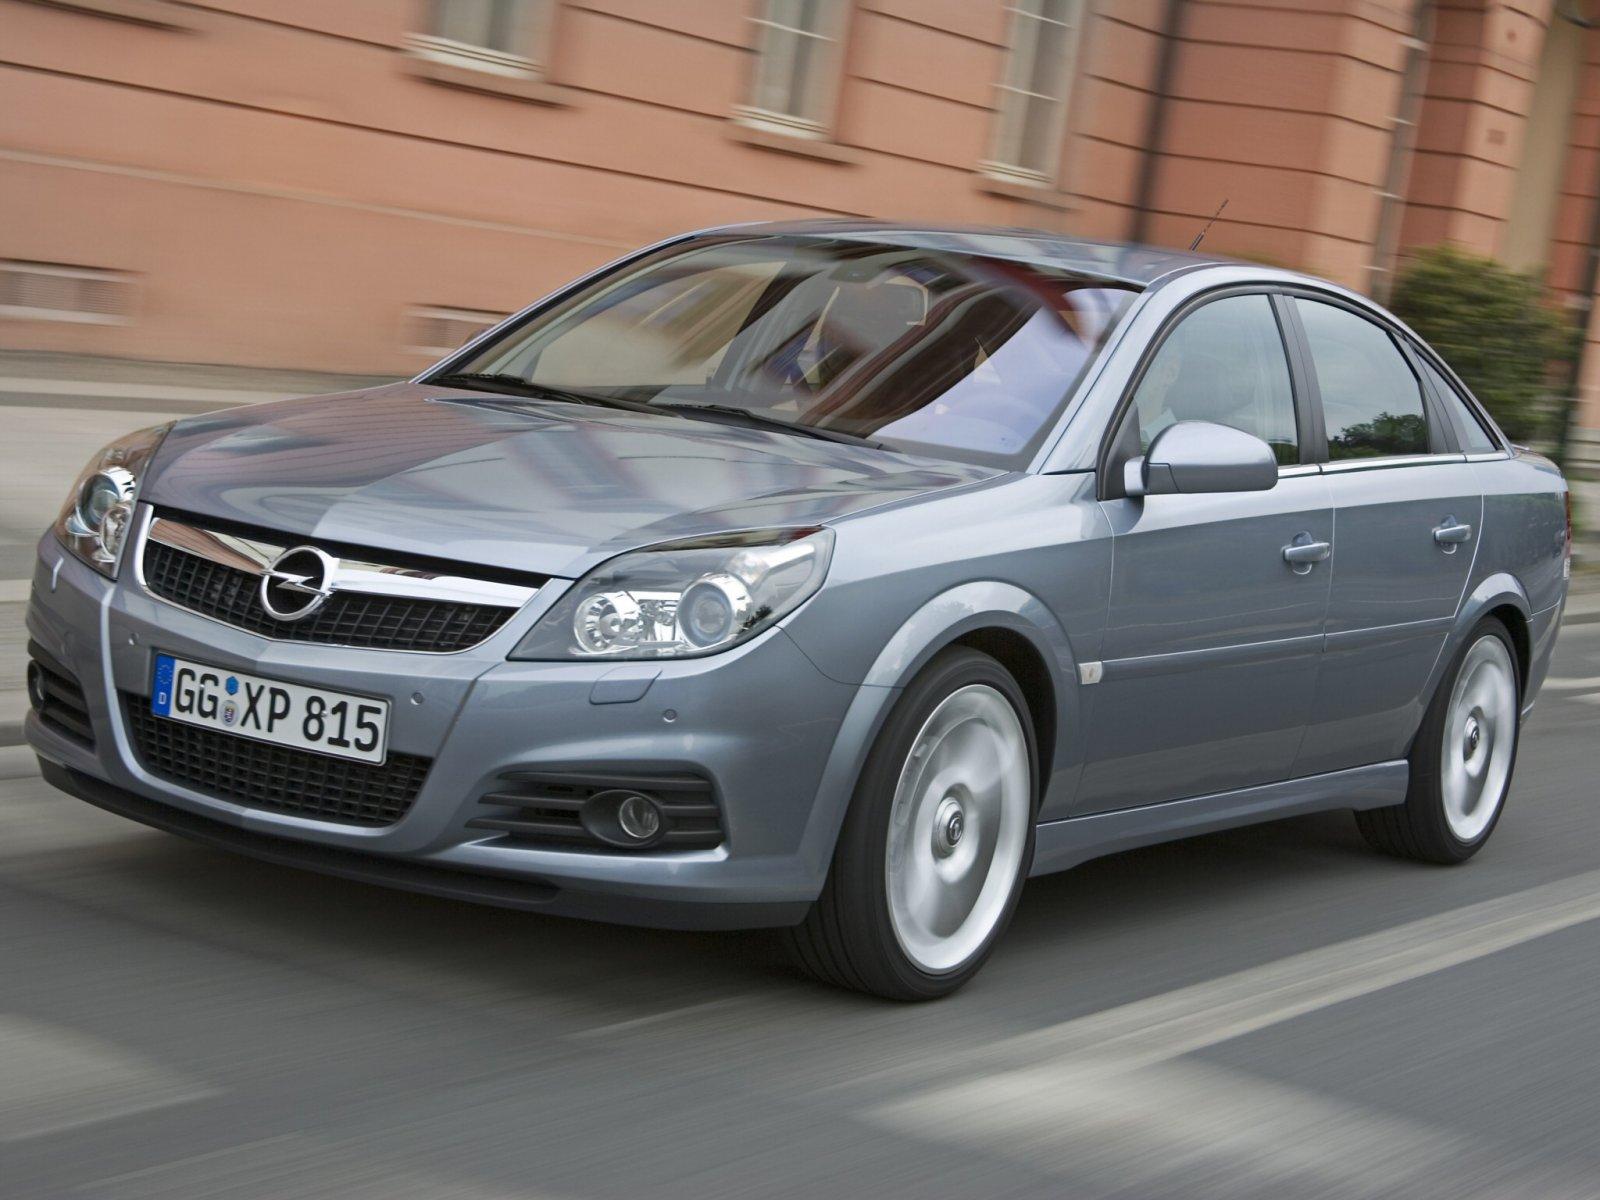 Opel (Опель) Vectra GTS 2005-2009 г.